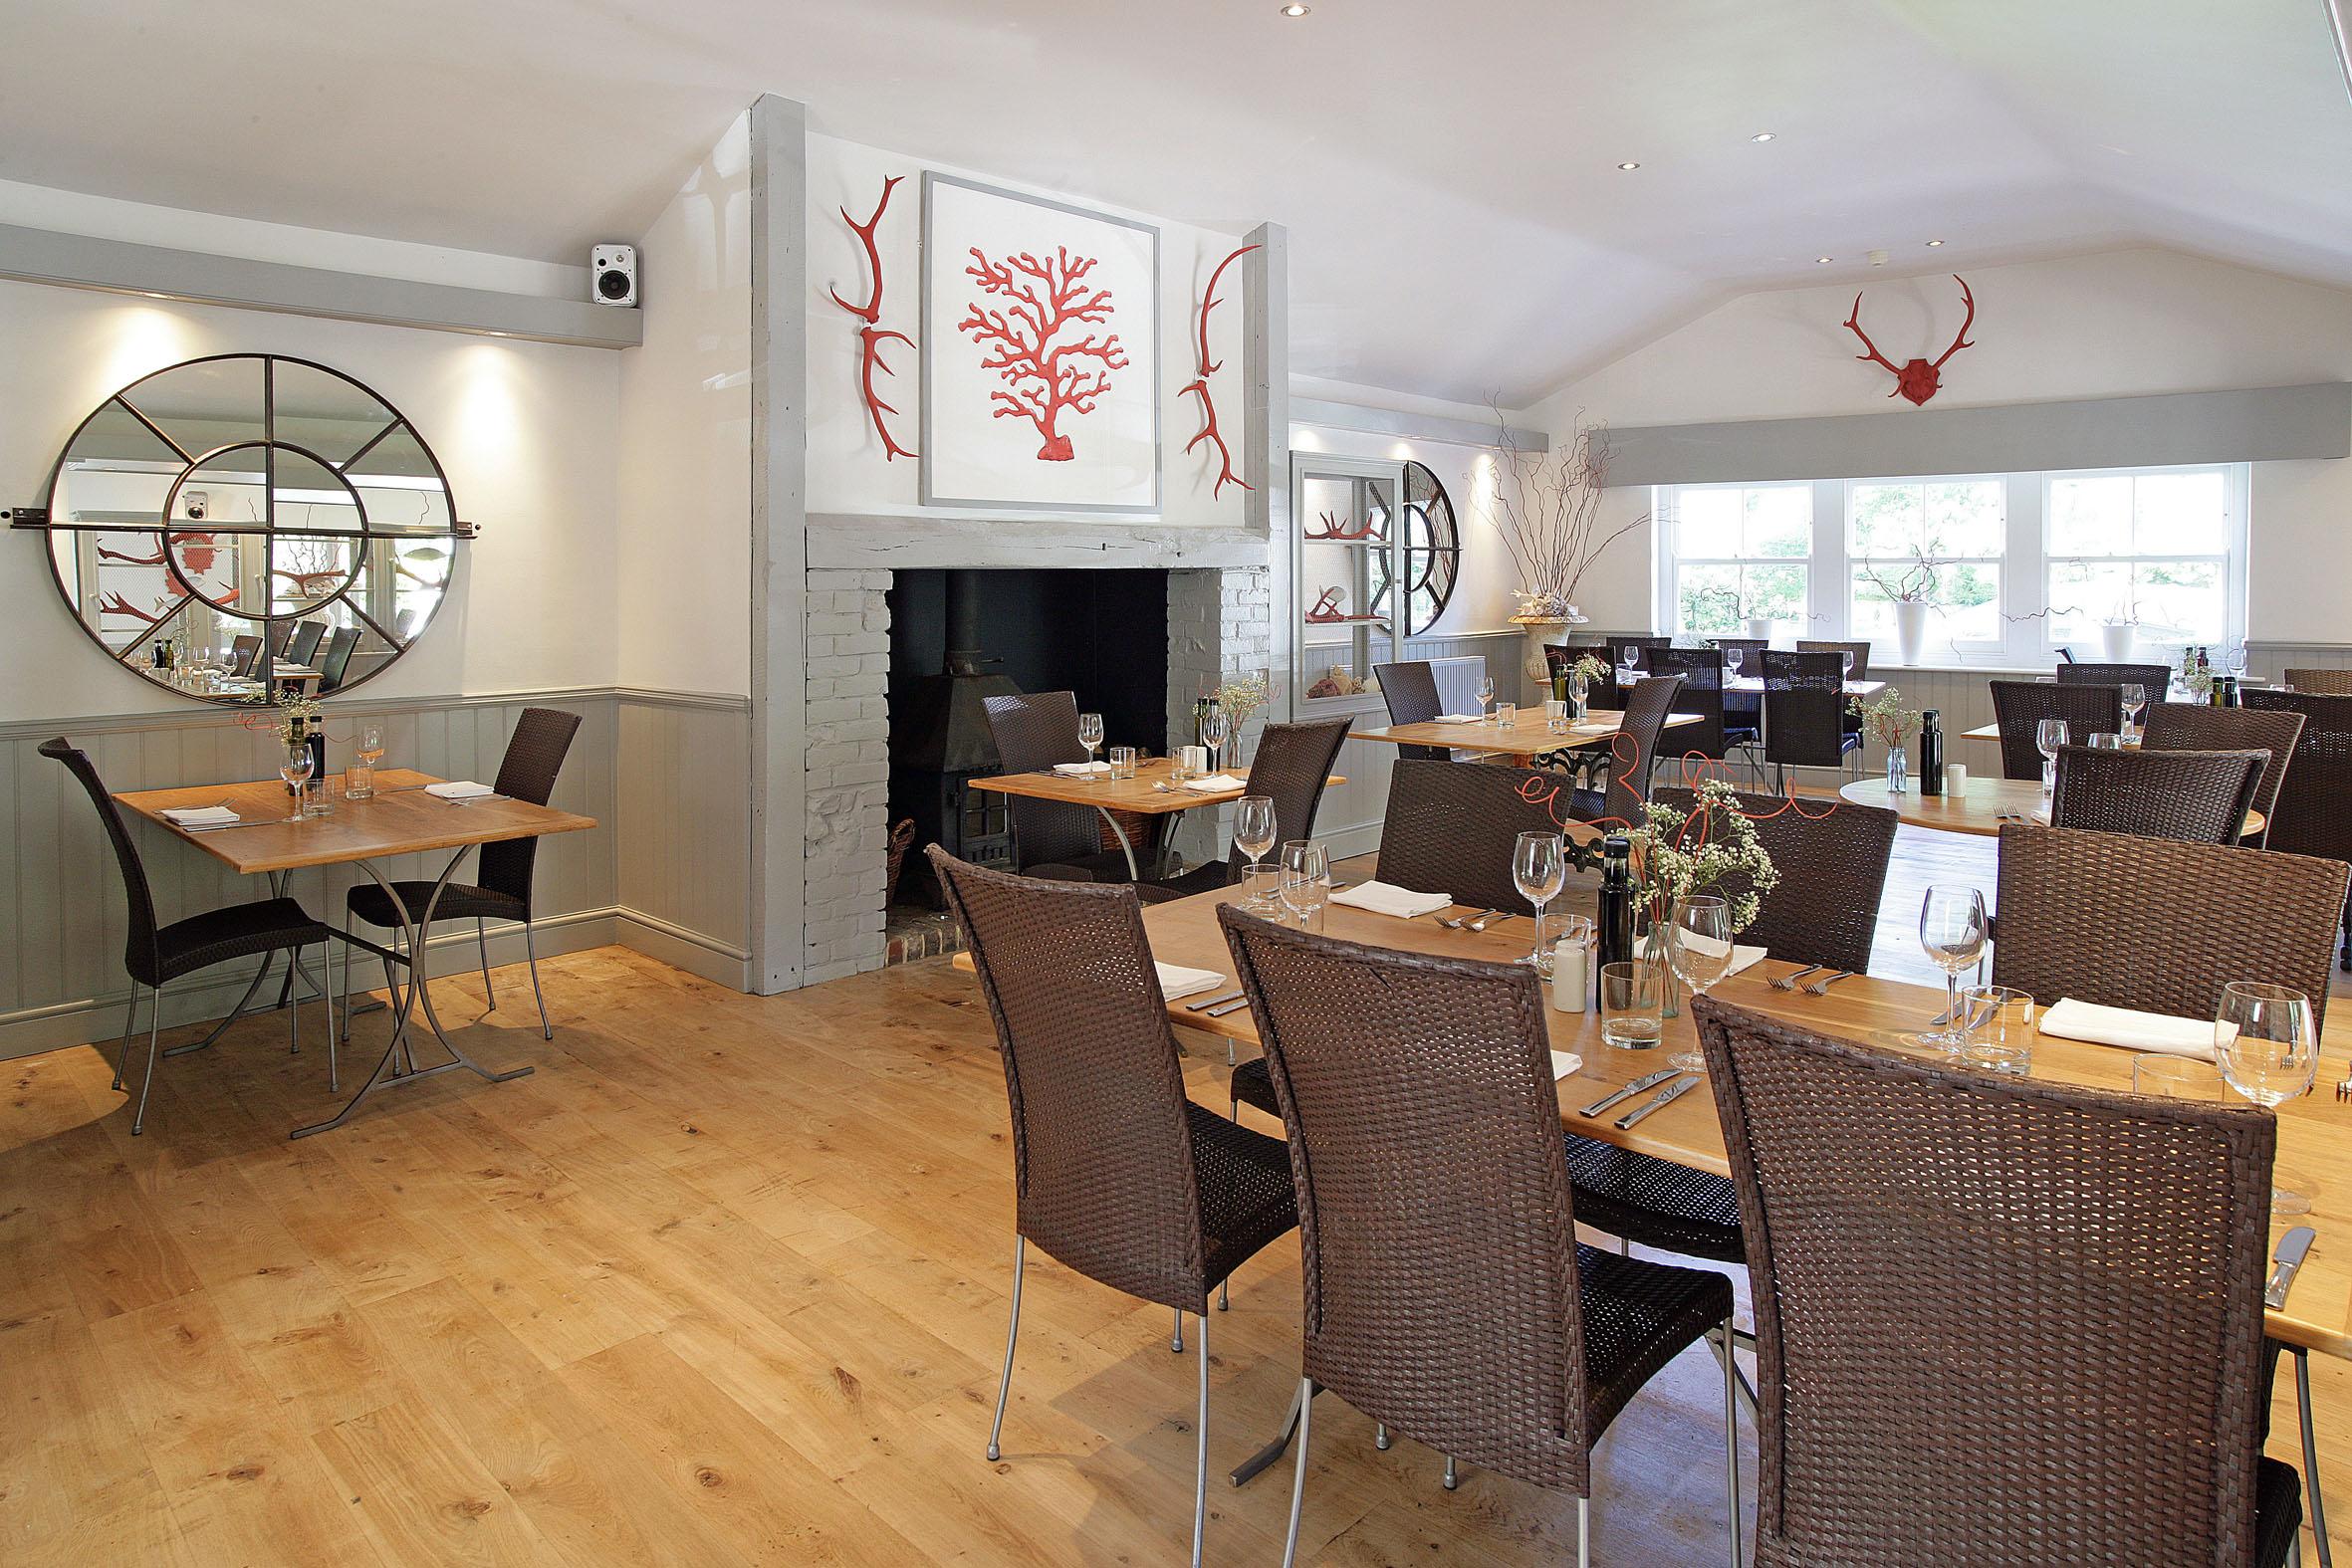 Wingrove Dining Room 2016-4-1.jpg